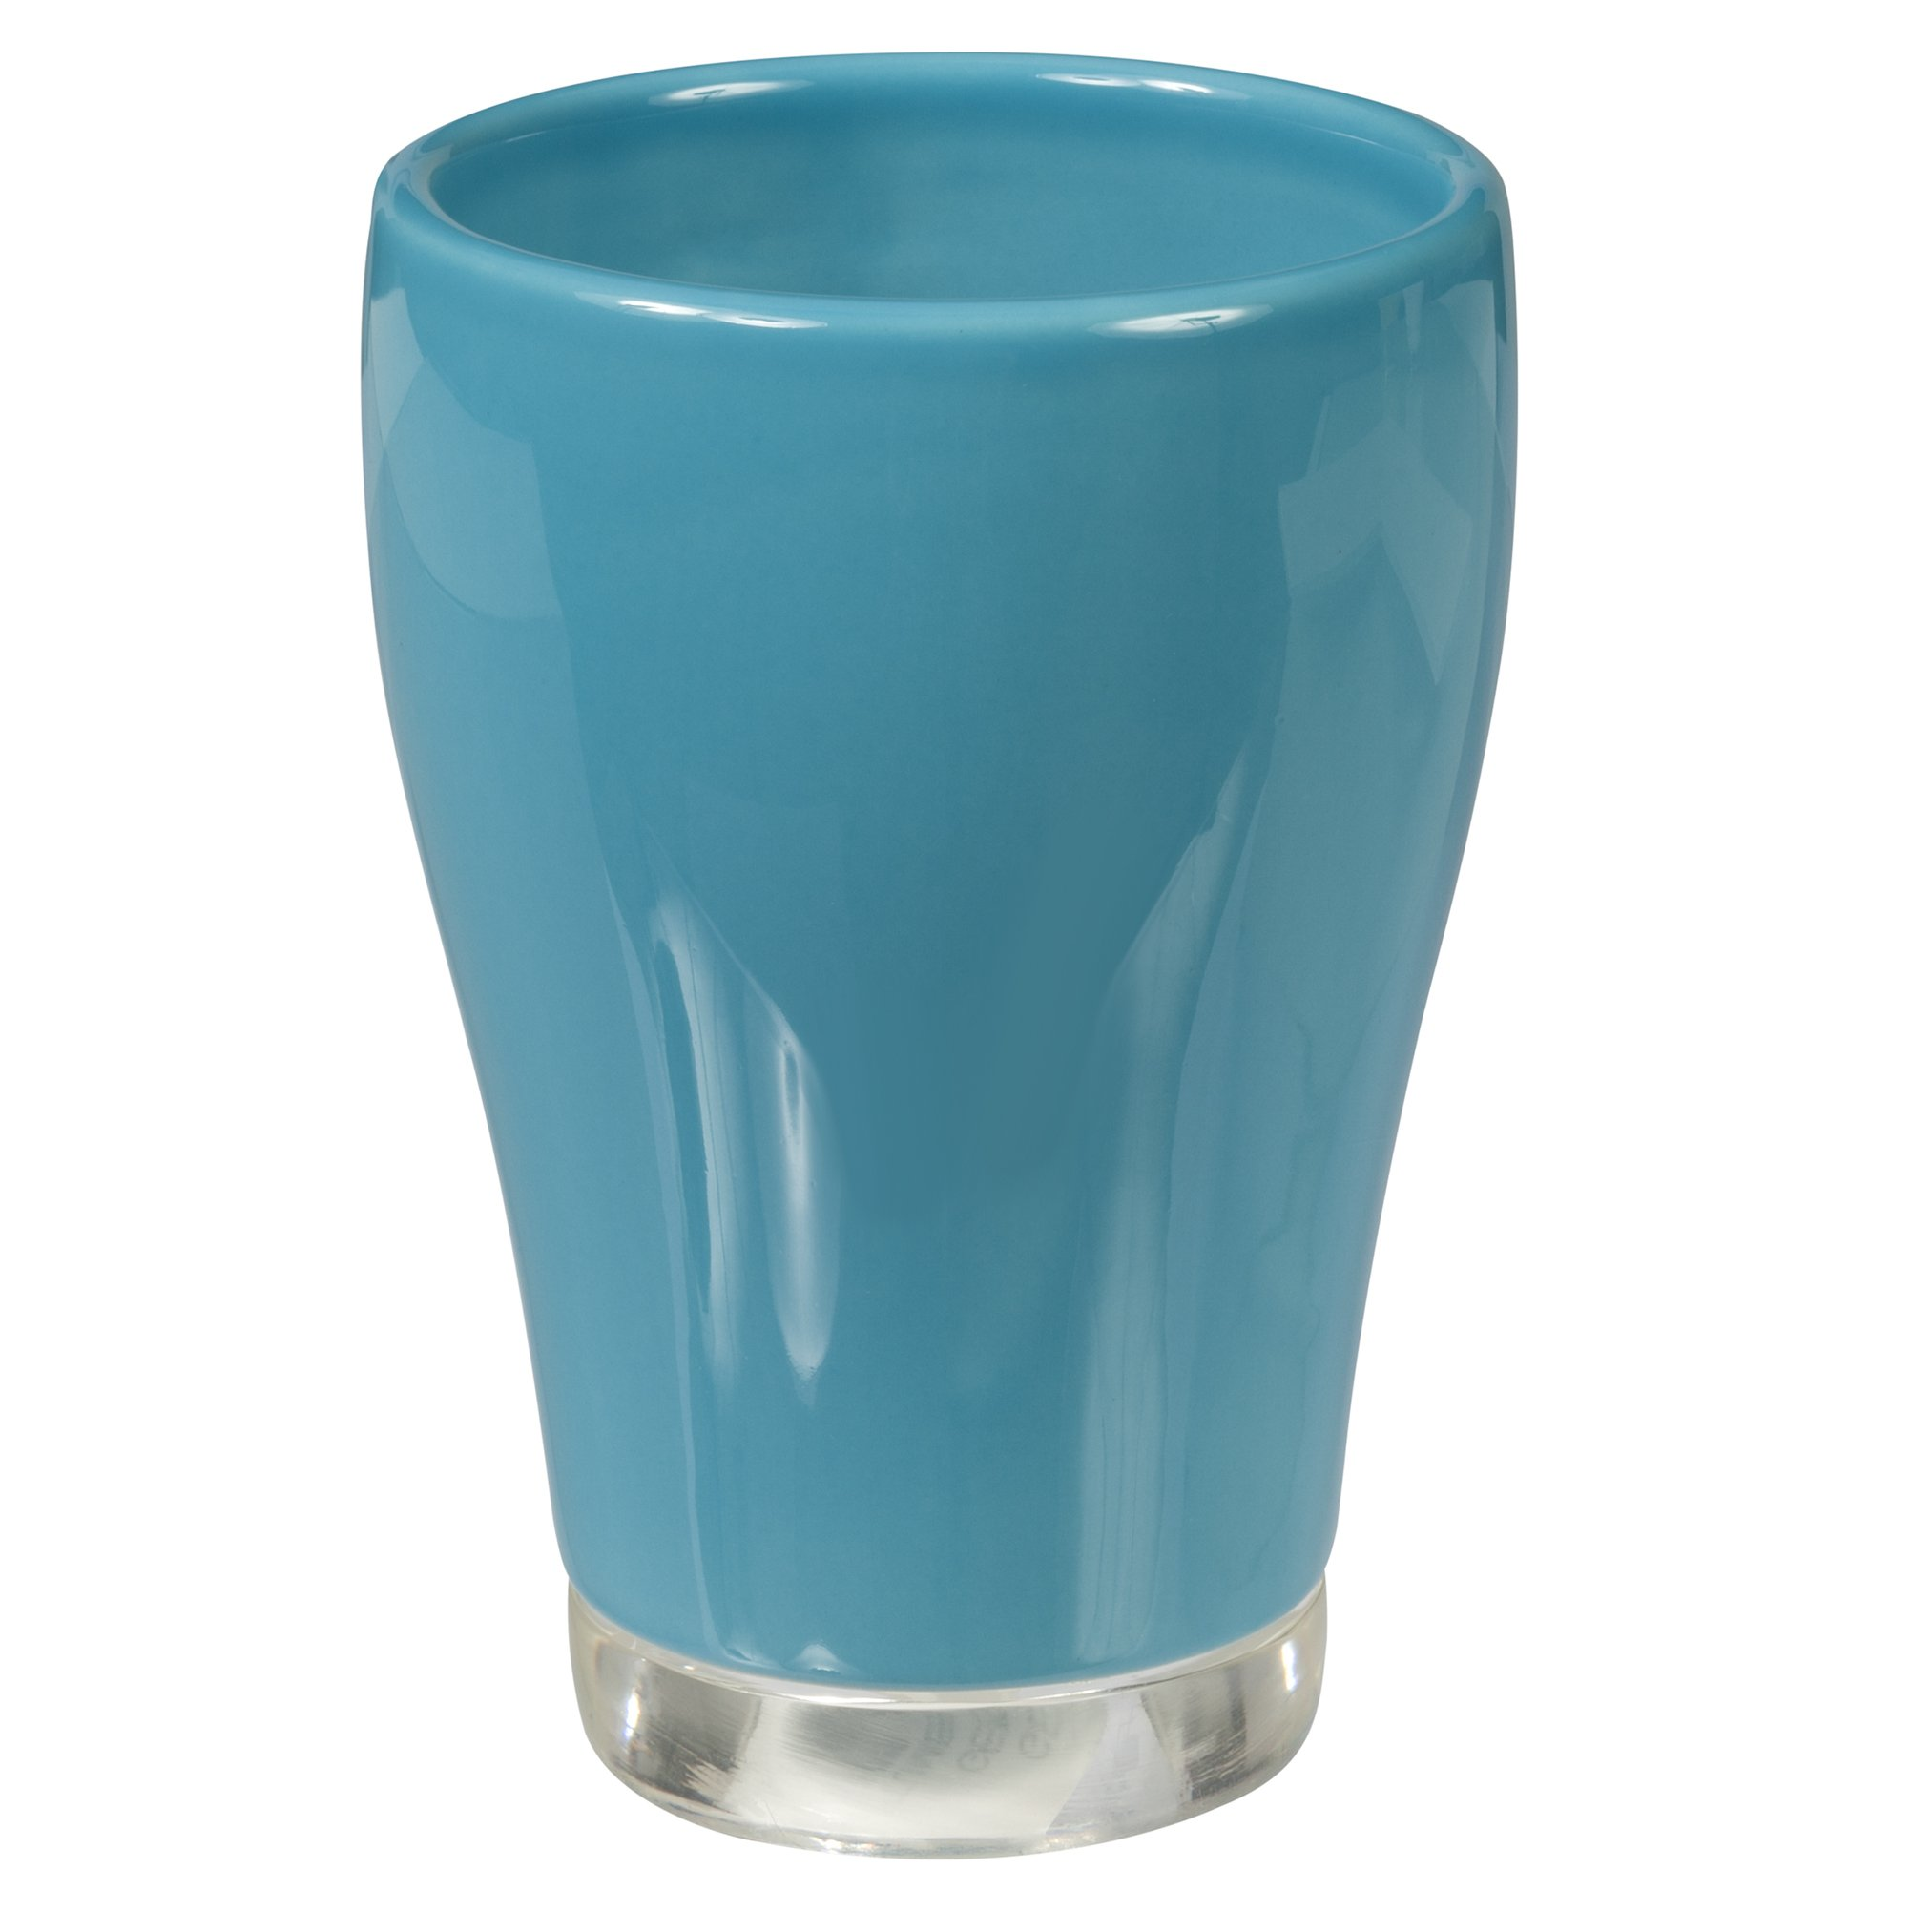 Creative Bath Products Gem Tumbler, Turquoise by Creative Bath (Image #1)